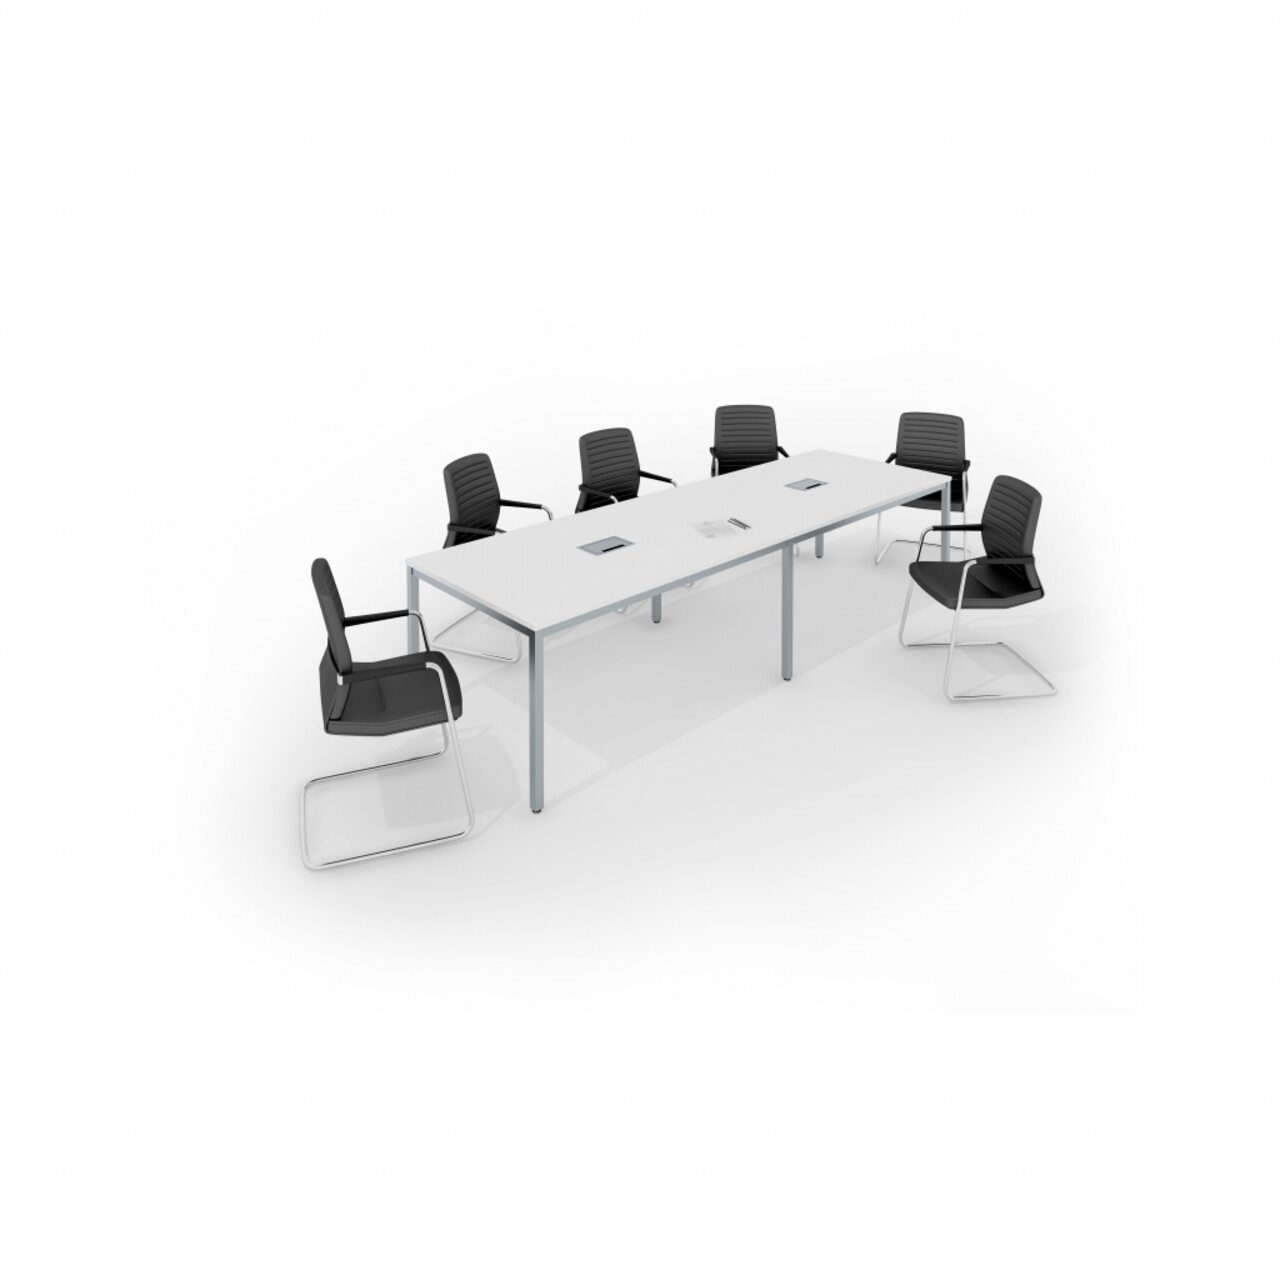 Мебель для персонала Avance - фото 11